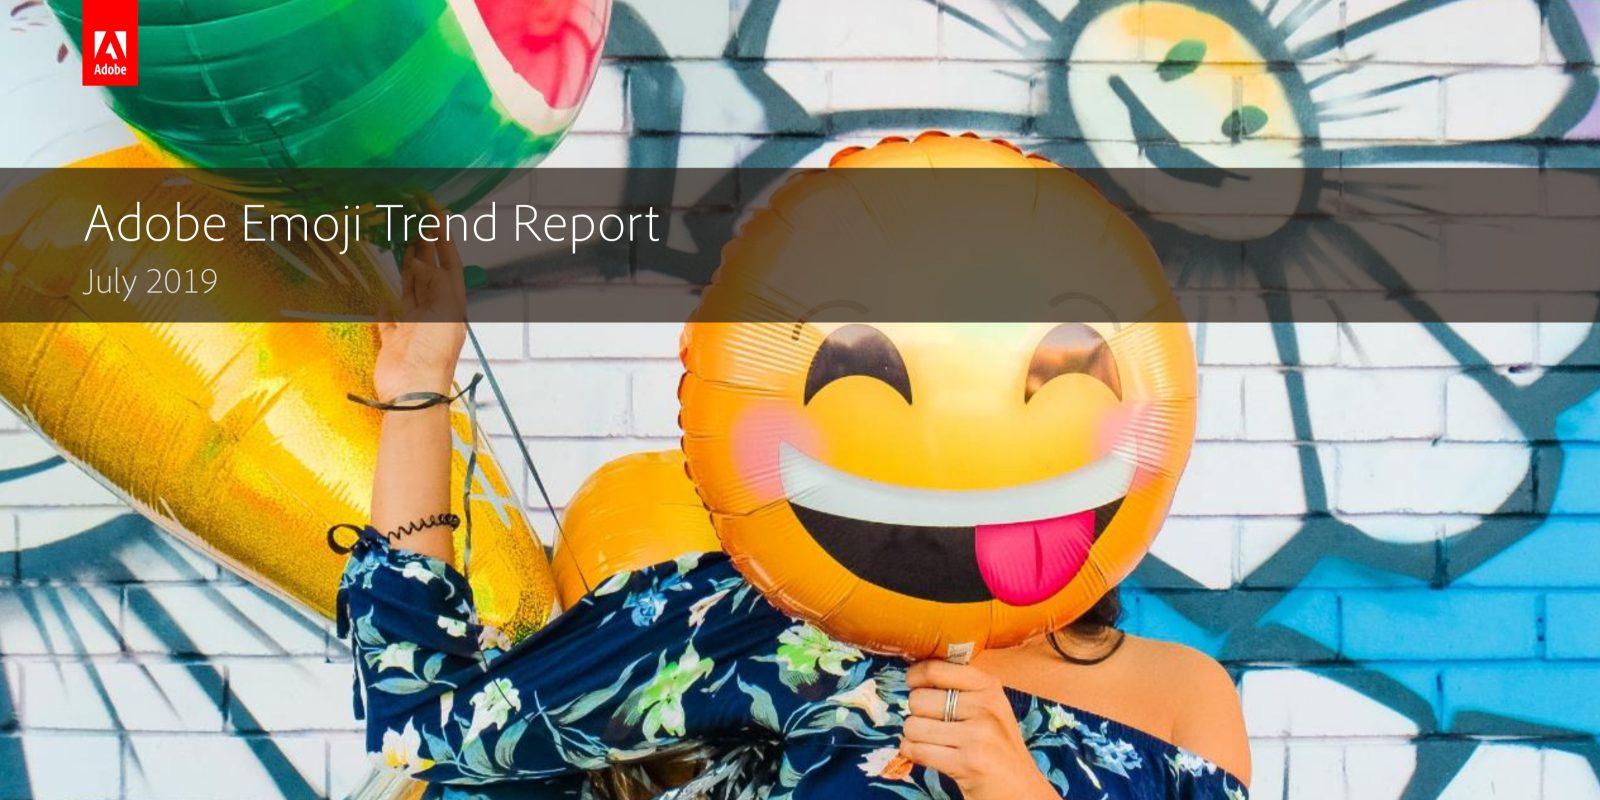 Study reveals the most popular emoji in honor of 'World Emoji Day'